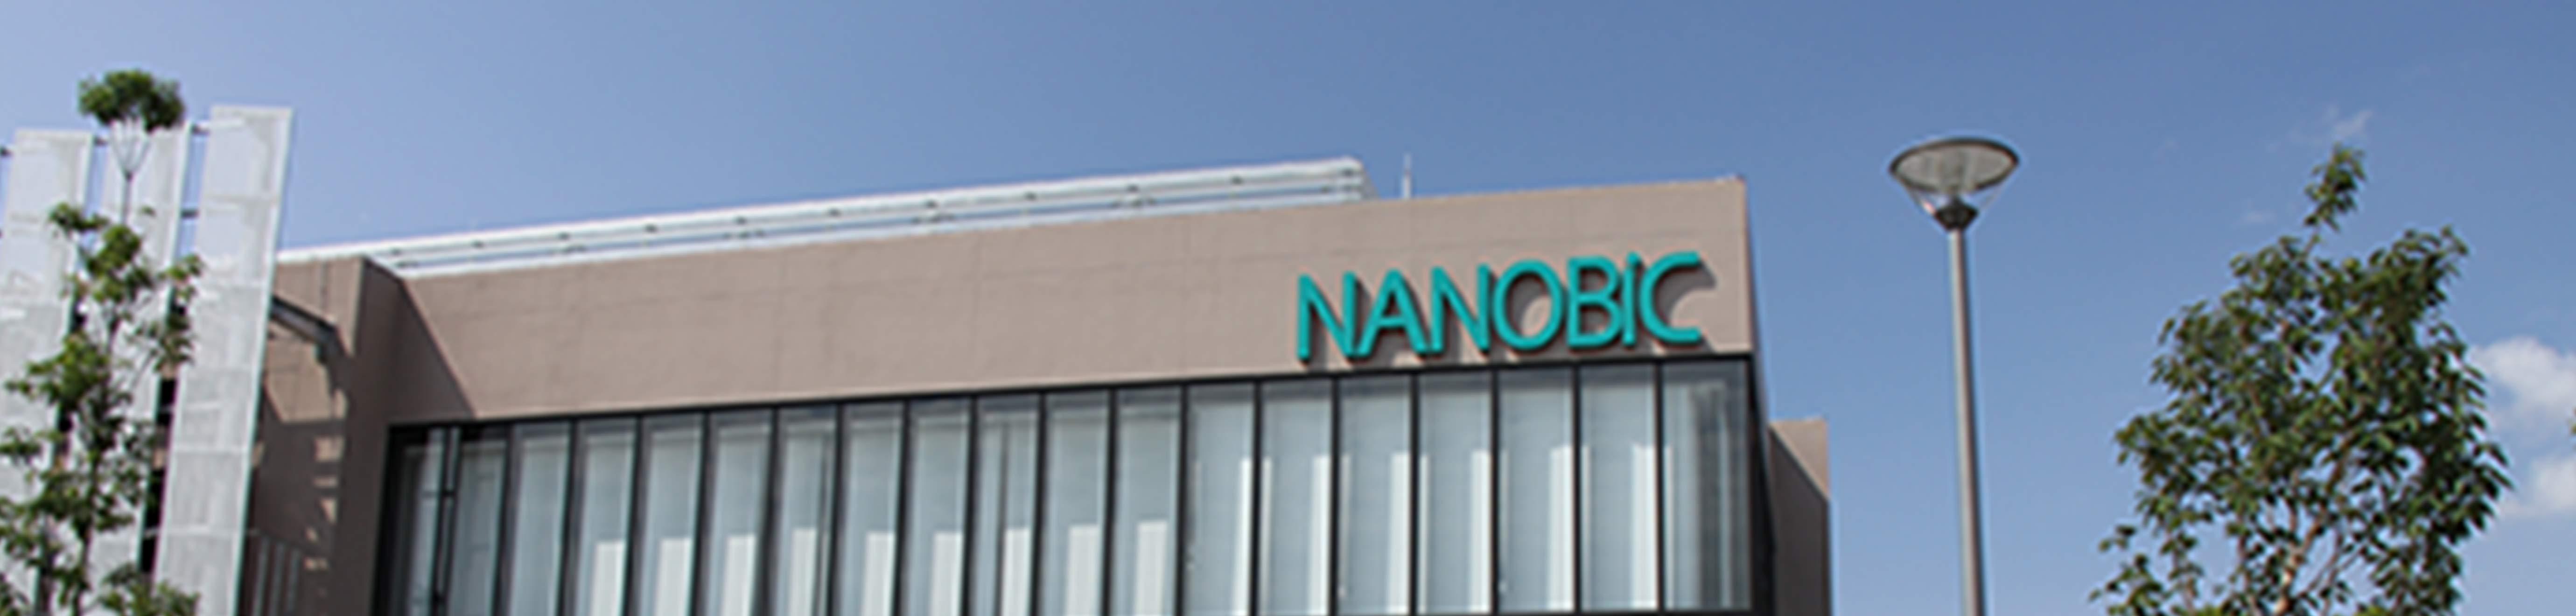 NANOBIC事業概要詳細ページを表す画像